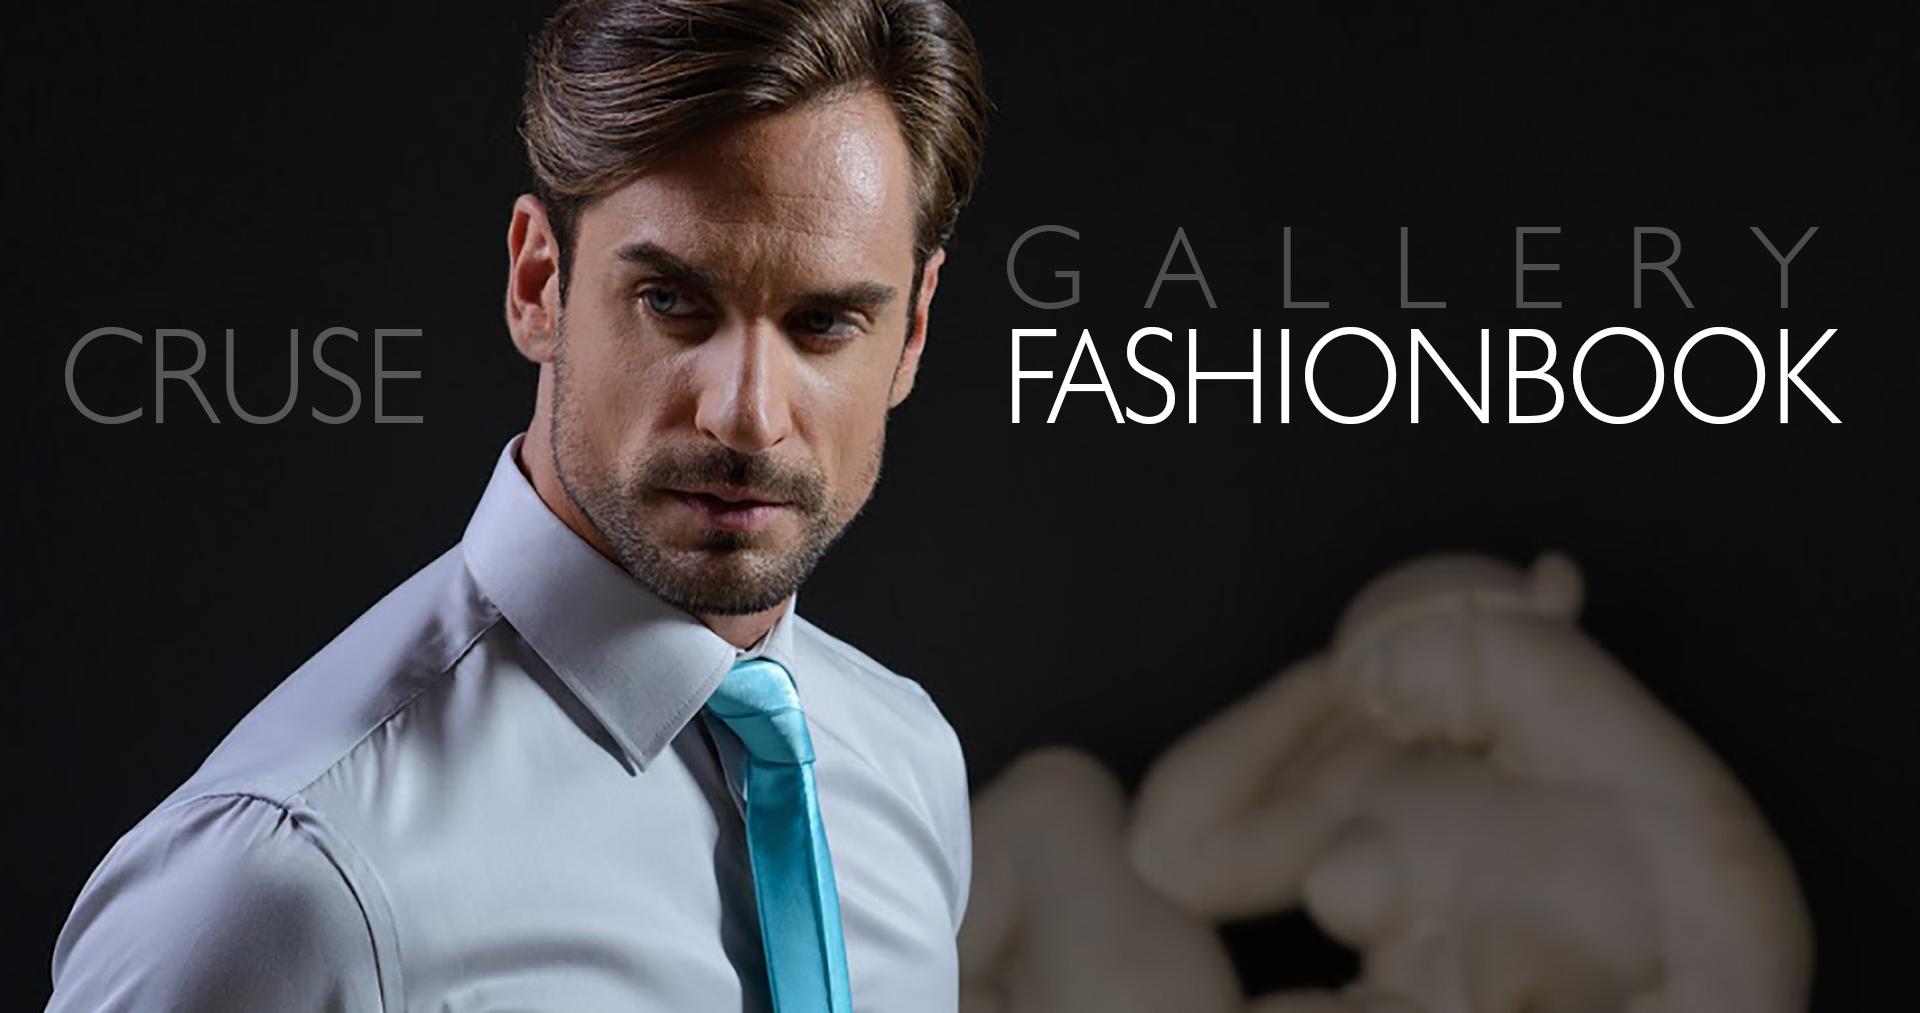 Fashionbook Gallery